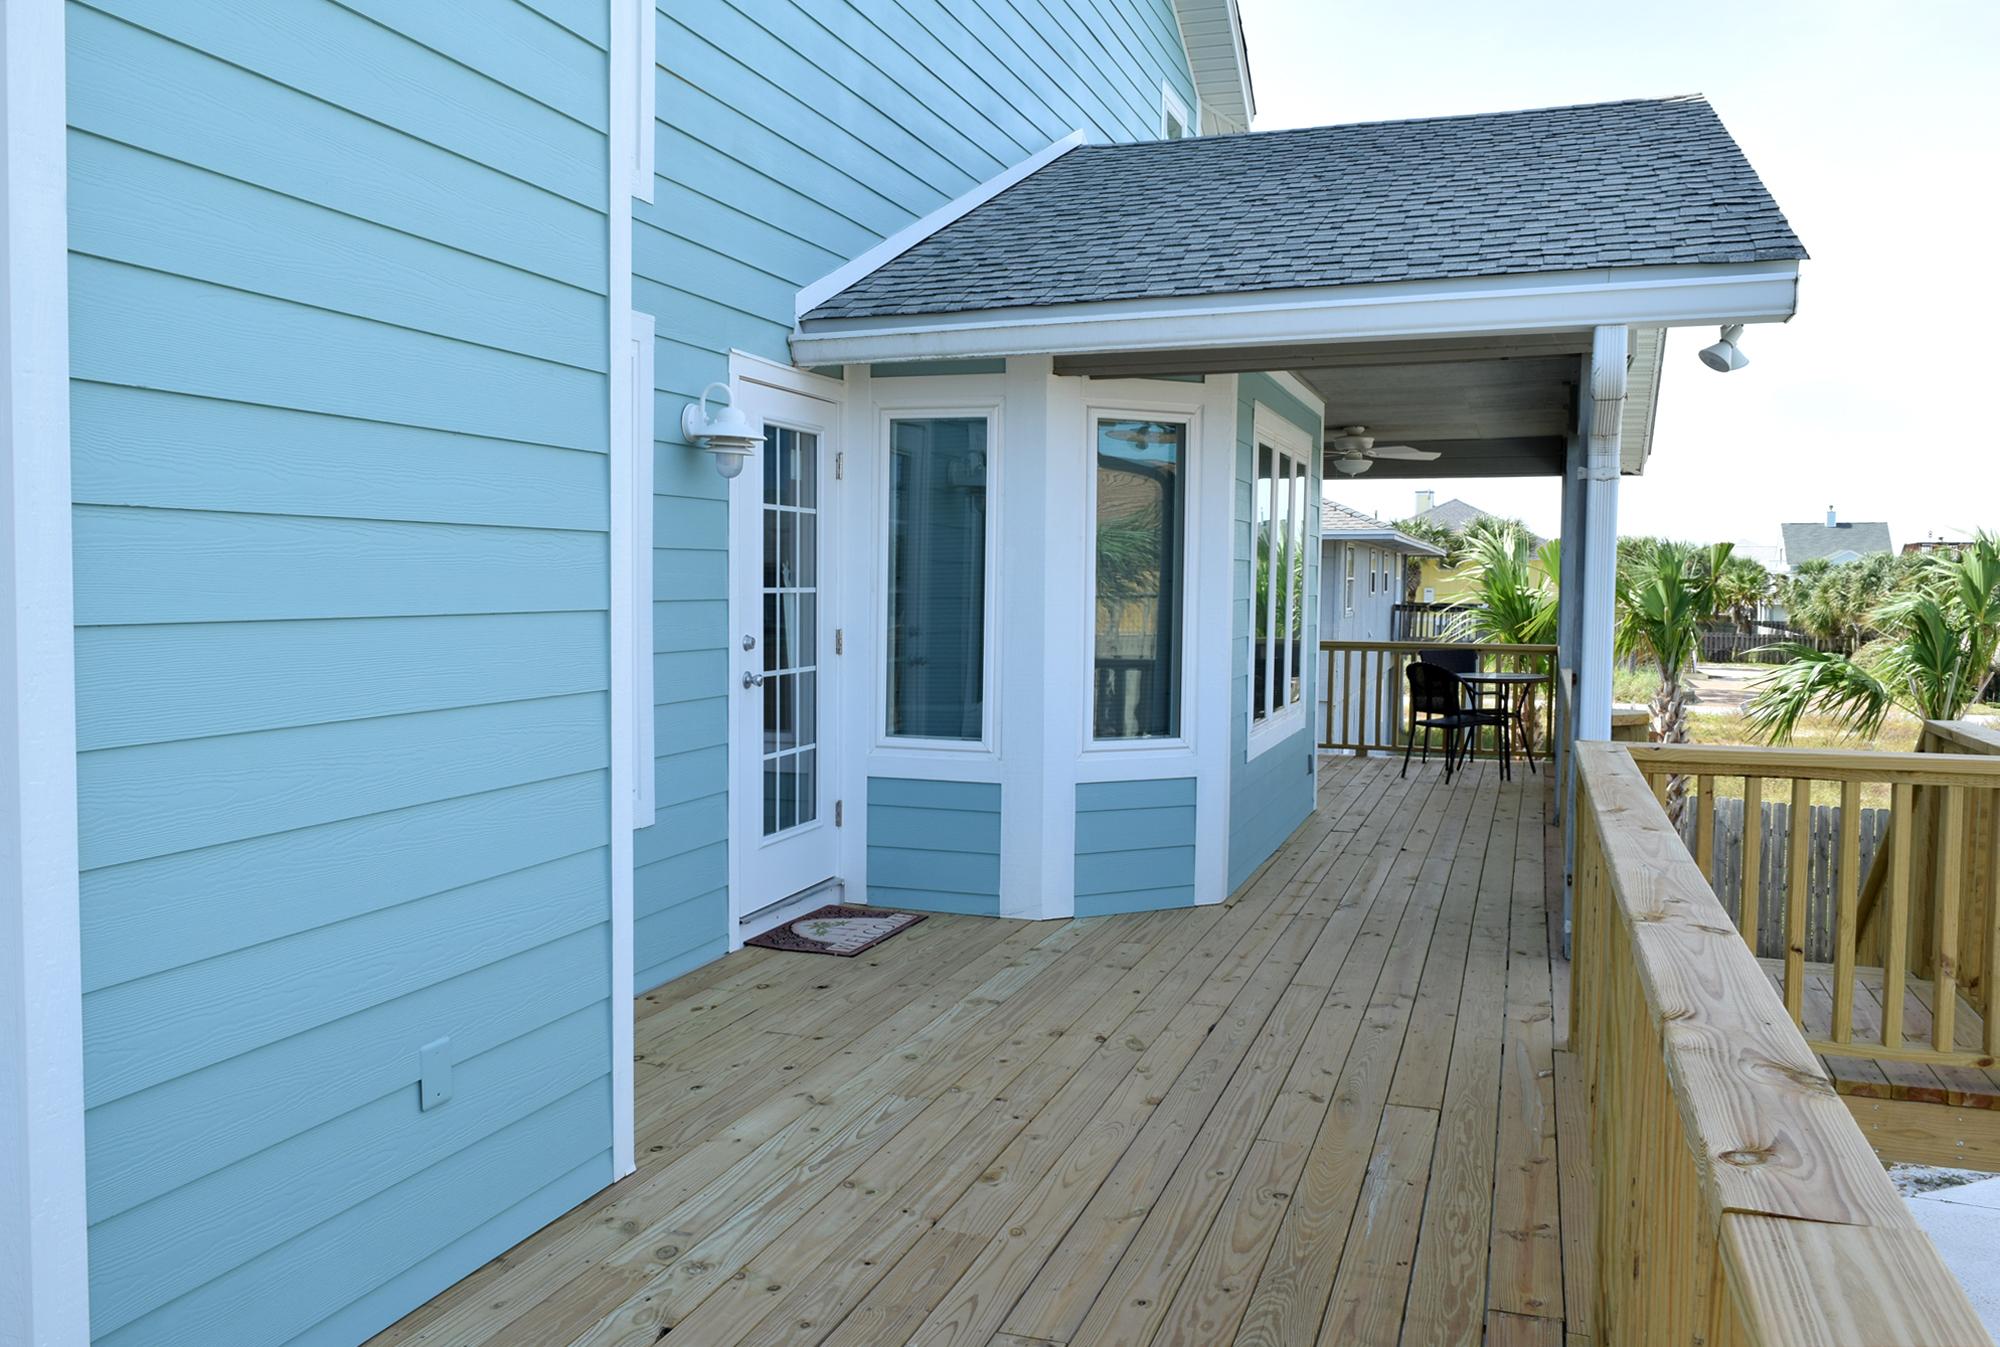 Maldonado 1103 House/Cottage rental in Pensacola Beach House Rentals in Pensacola Beach Florida - #20